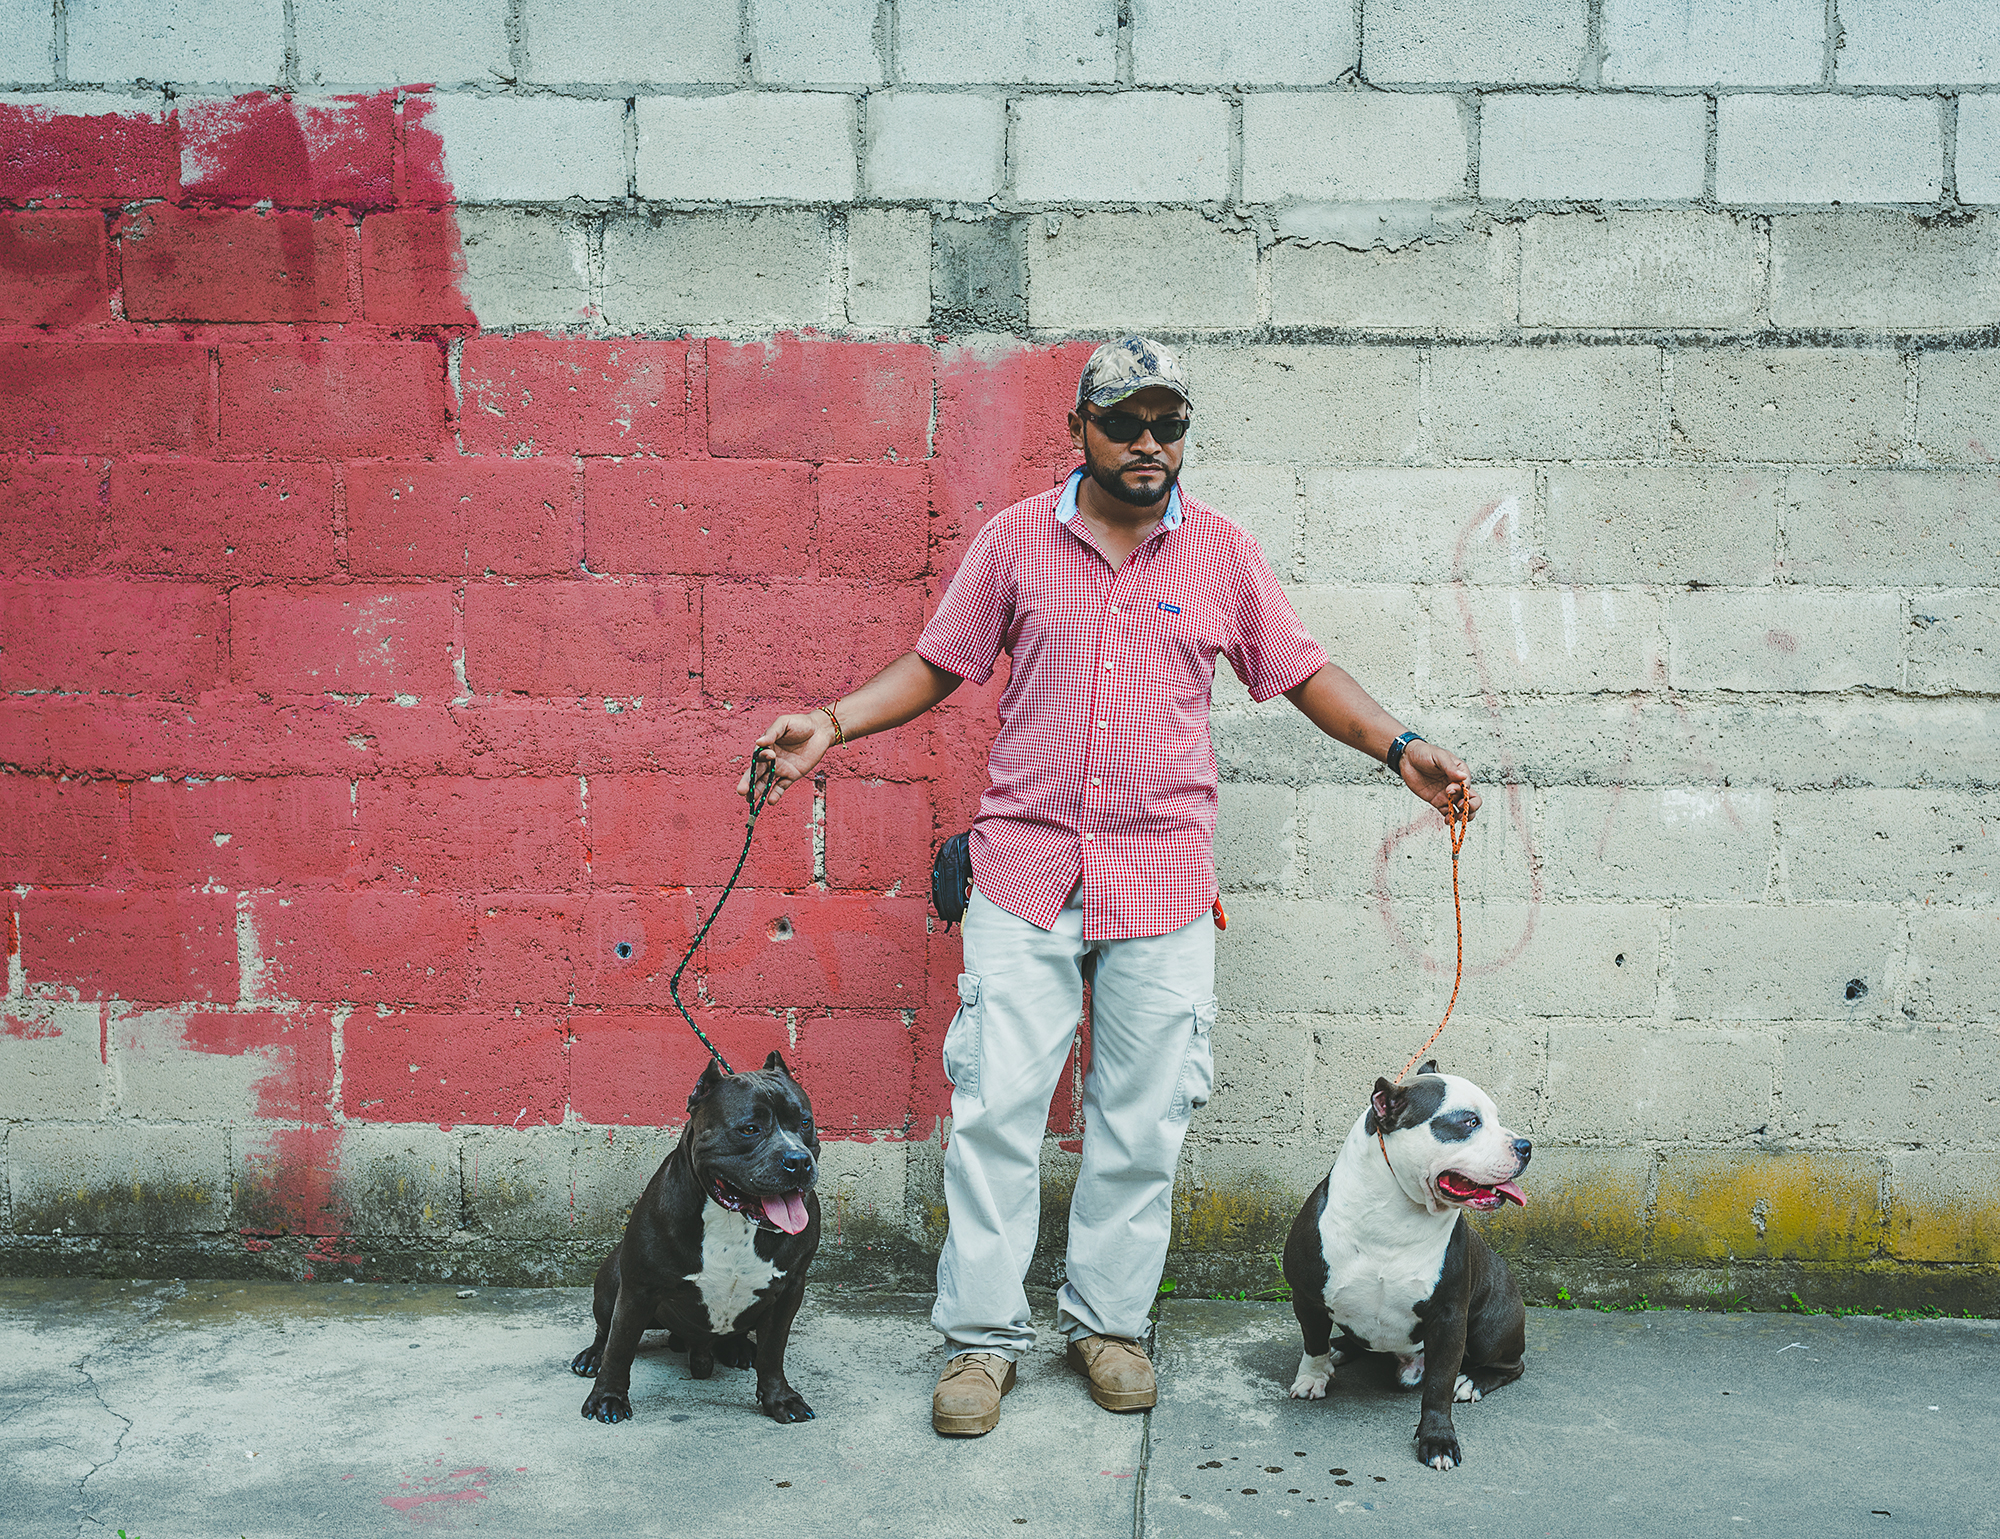 Antigua | Departamento De Sacatépequez